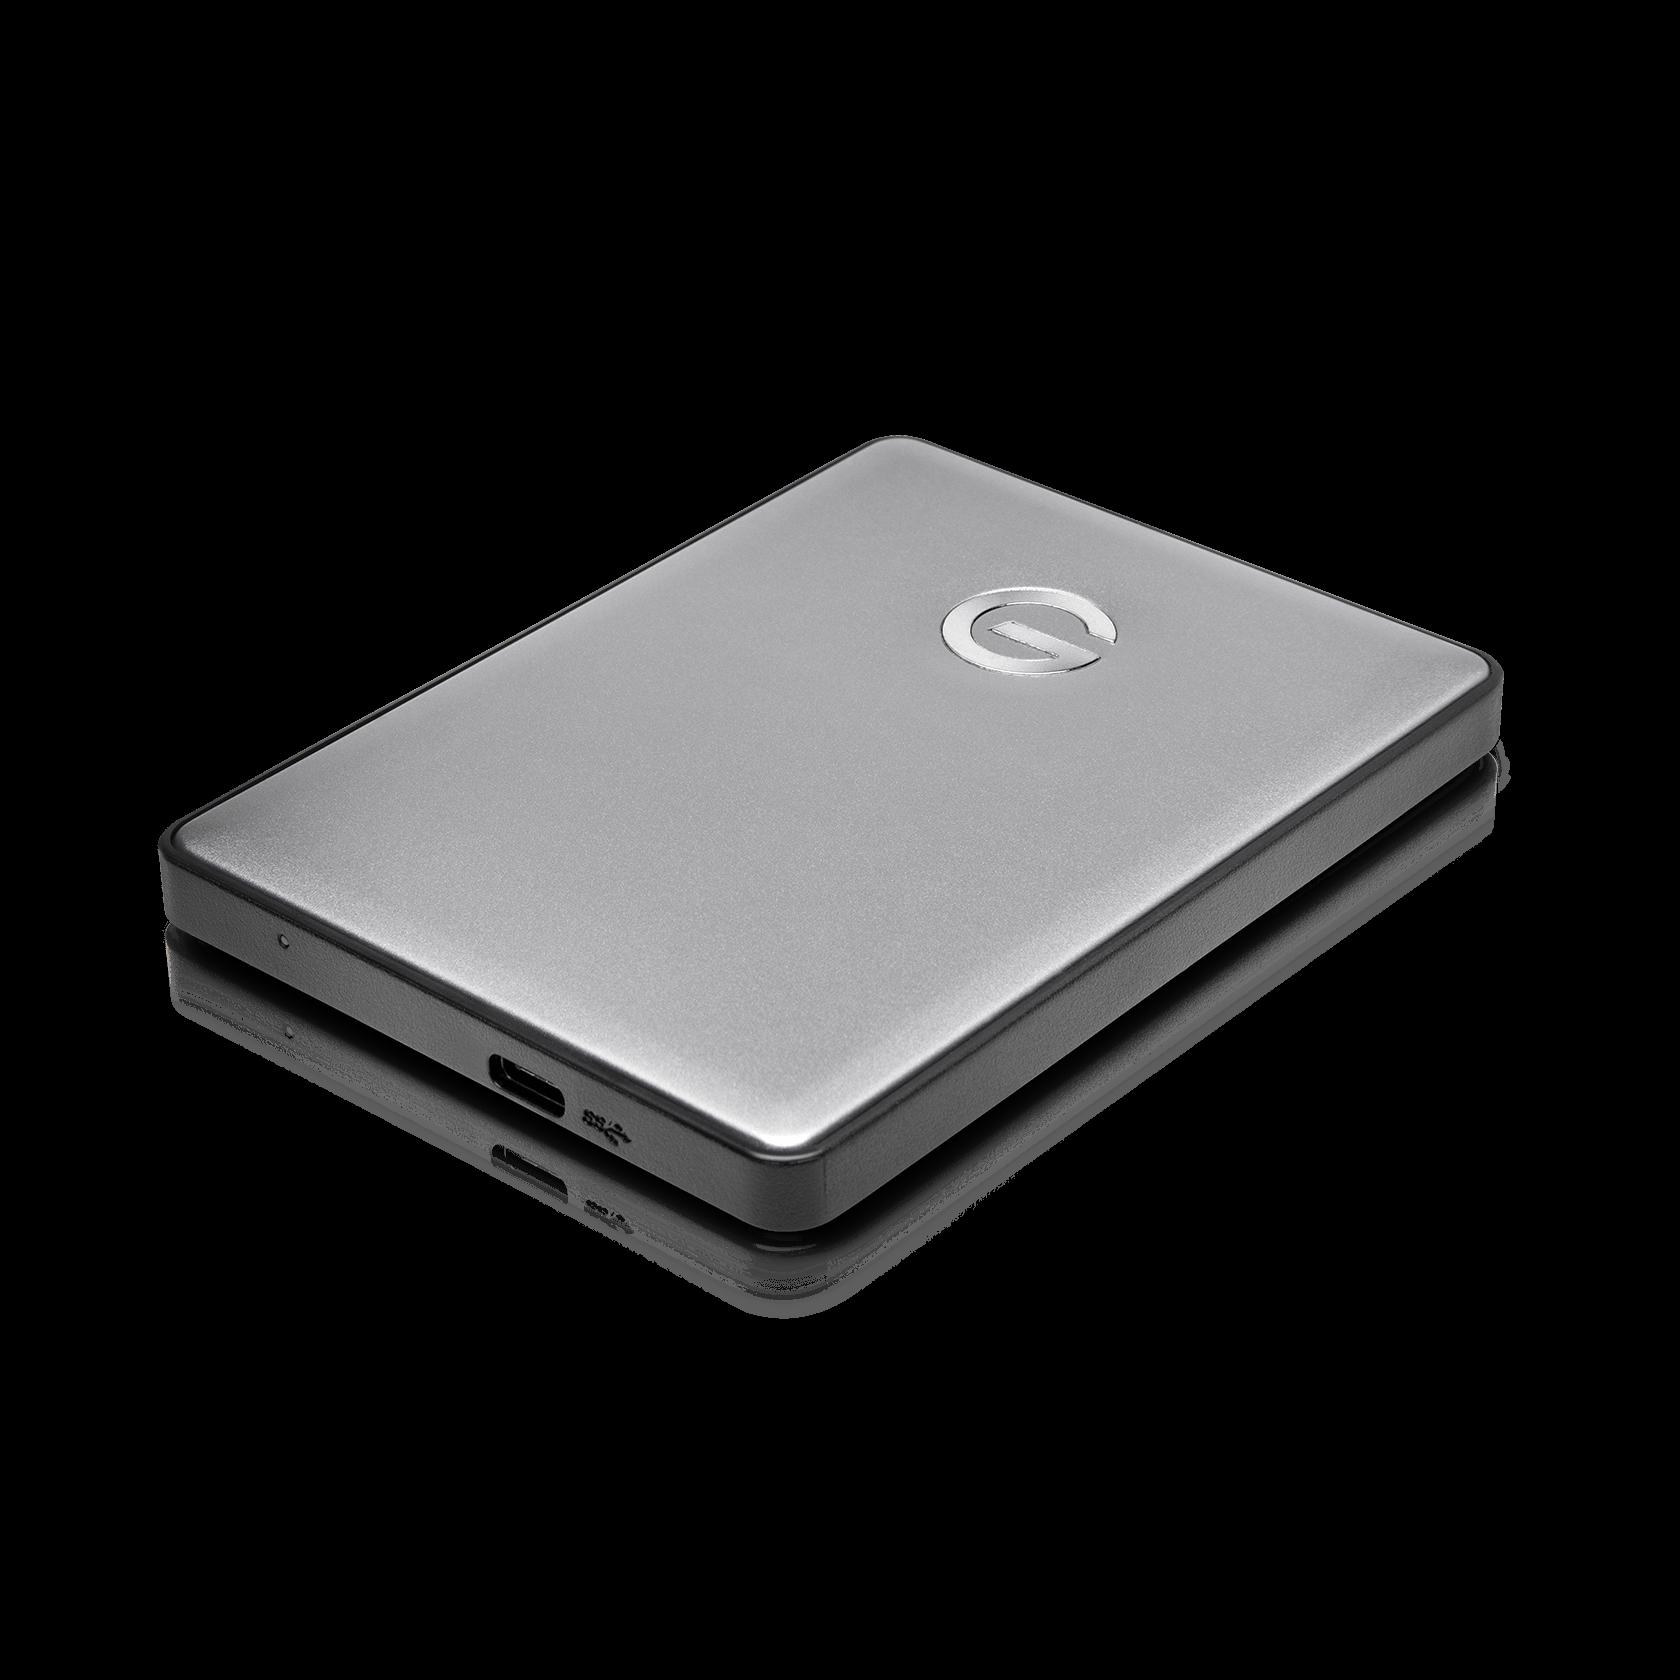 G-Technology Silver G-Tech G-DRIVE 4TB External USB Type C Hard Drive